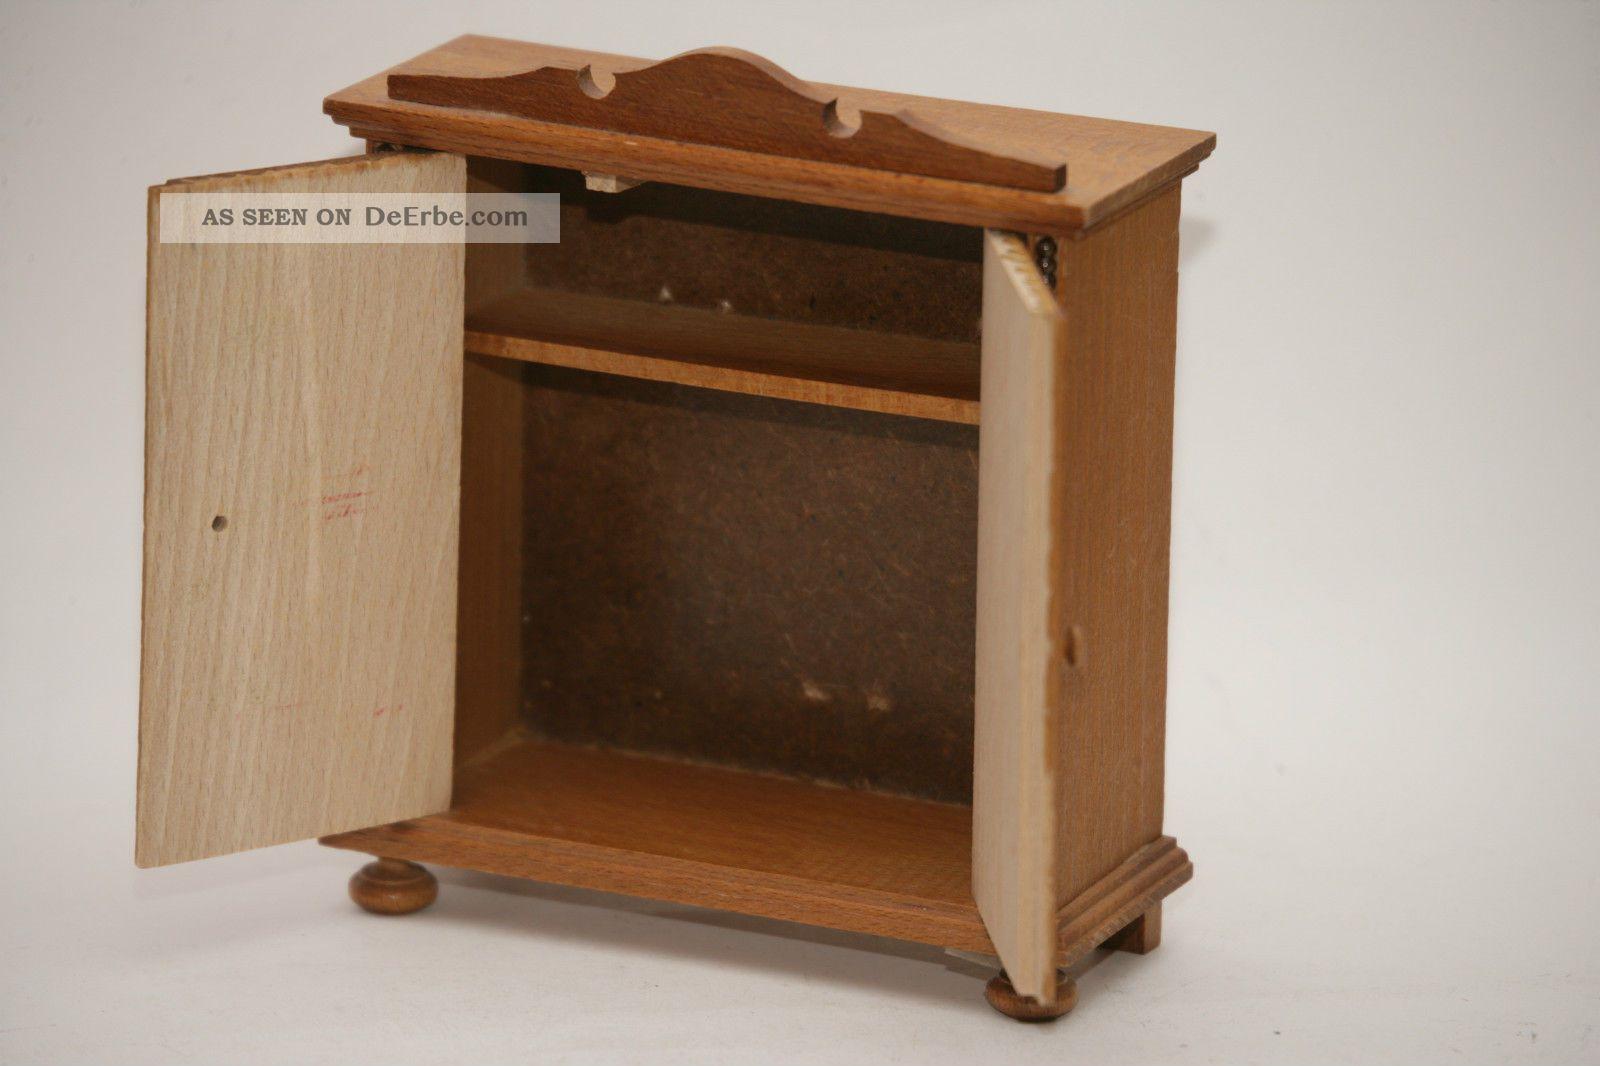 bauern m bel f r die puppenstube aus 70er jahre ddr holz puppe. Black Bedroom Furniture Sets. Home Design Ideas